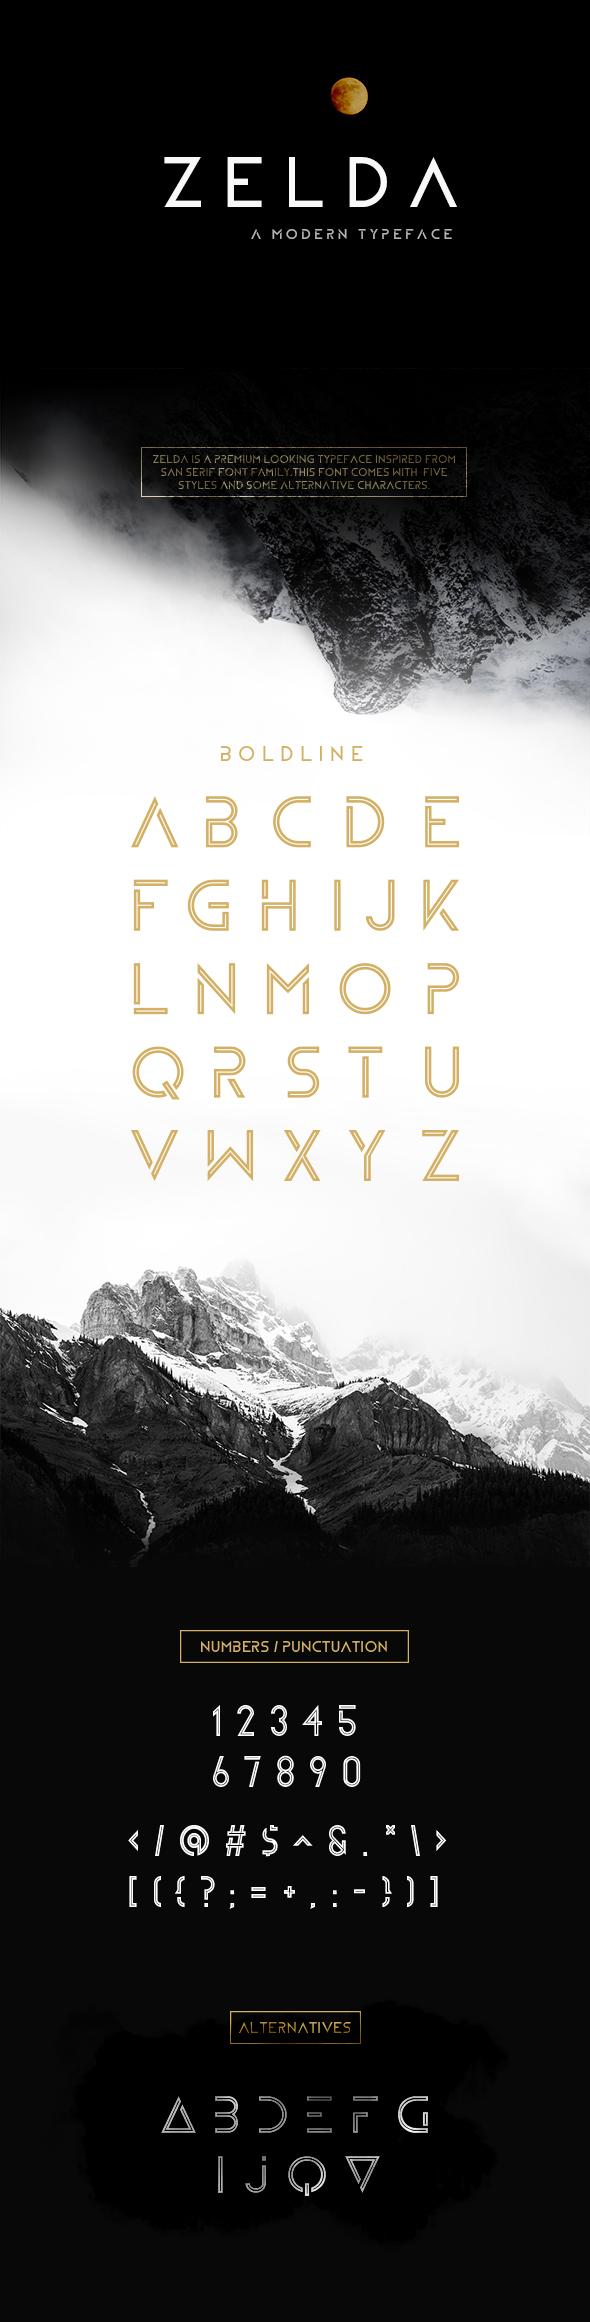 Zelda Typeface (Boldline) - Sans-Serif Fonts